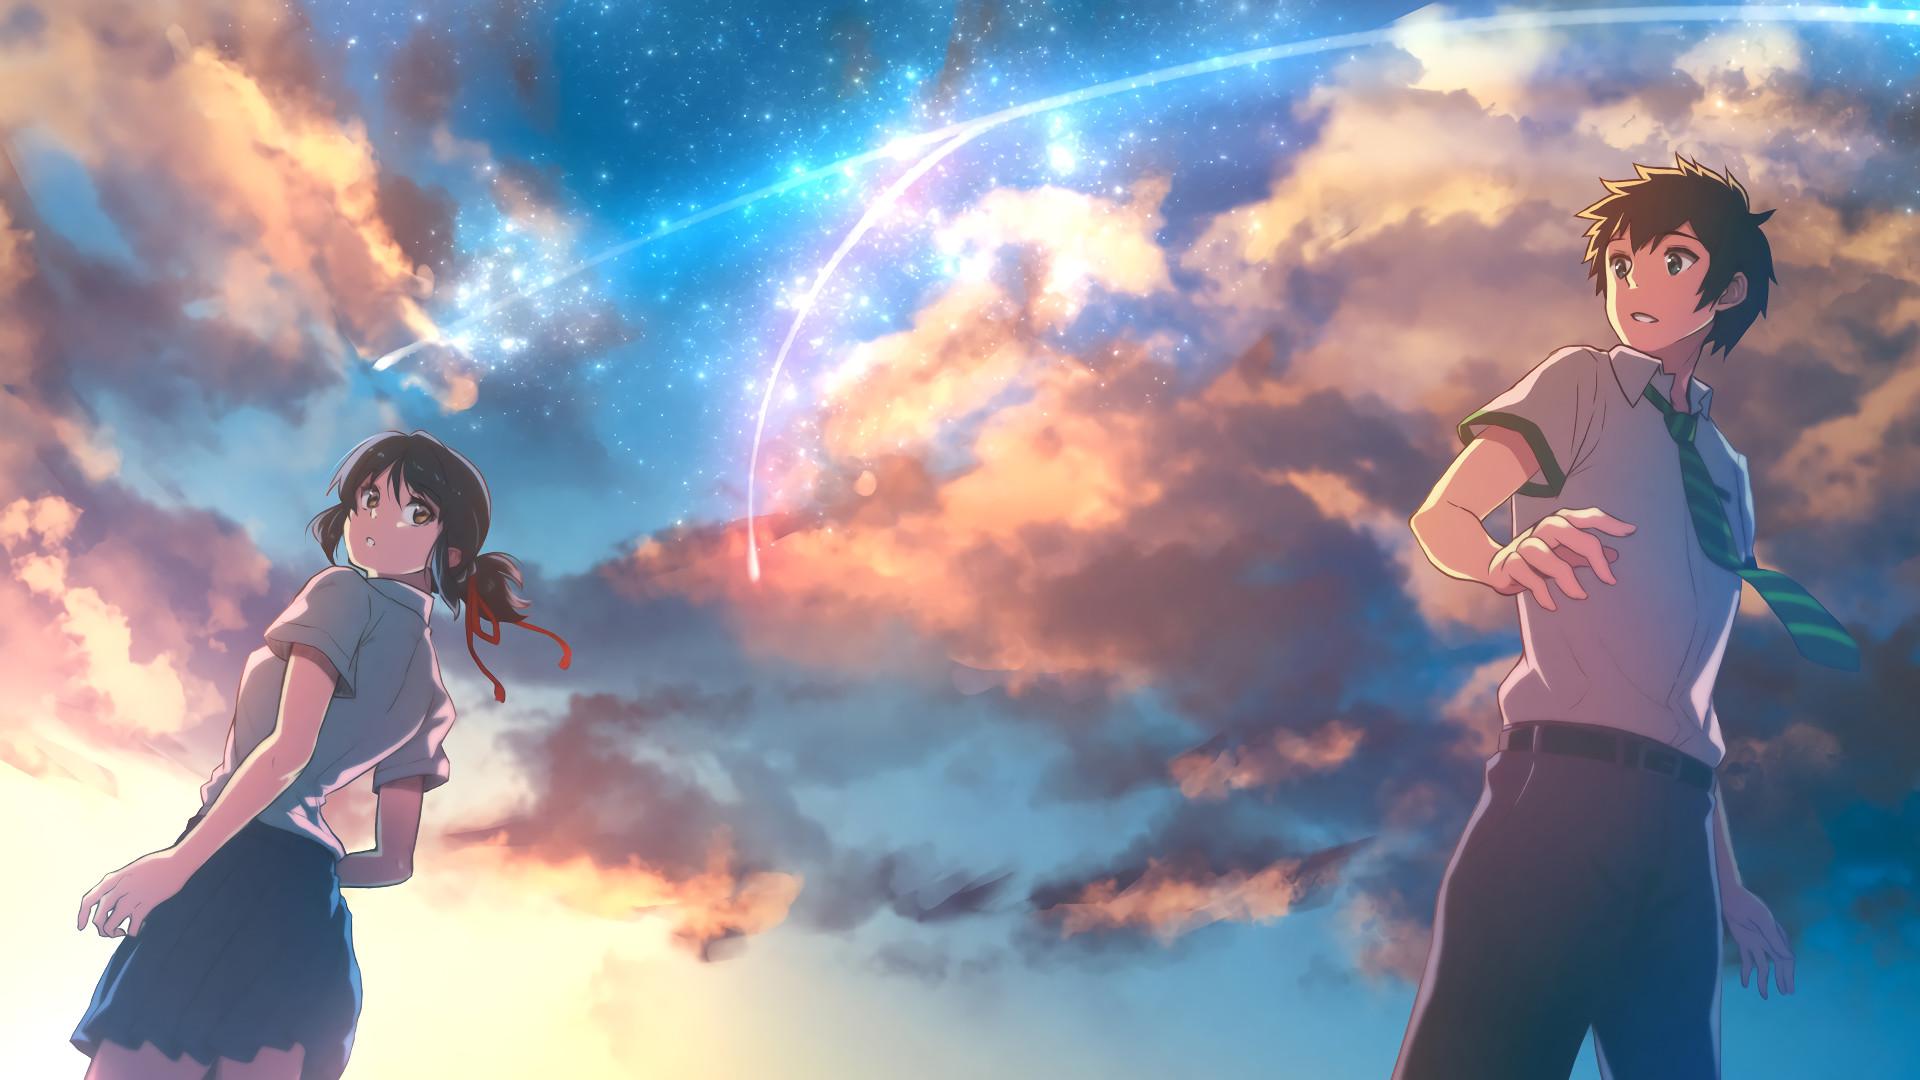 Anime Wallpaper 1080p